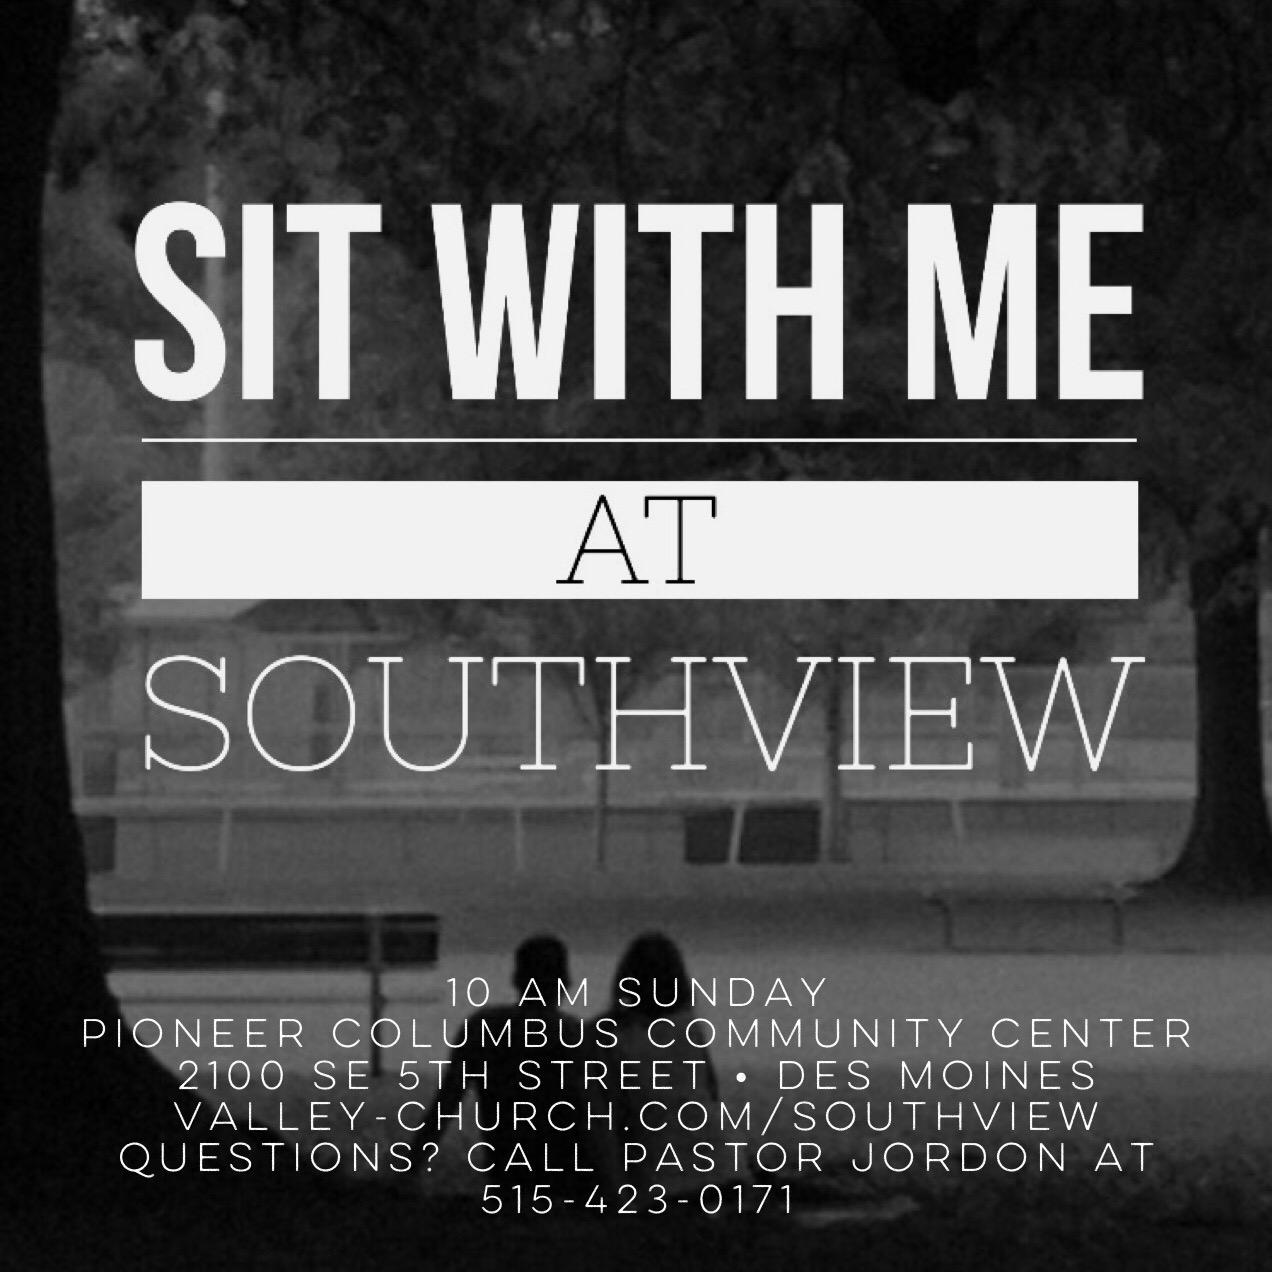 Sit With Me Southview copy.jpg